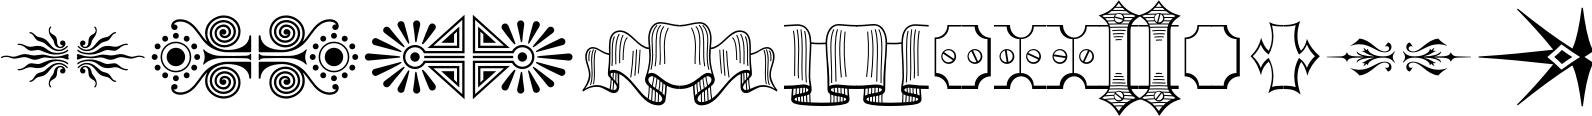 Finetitle